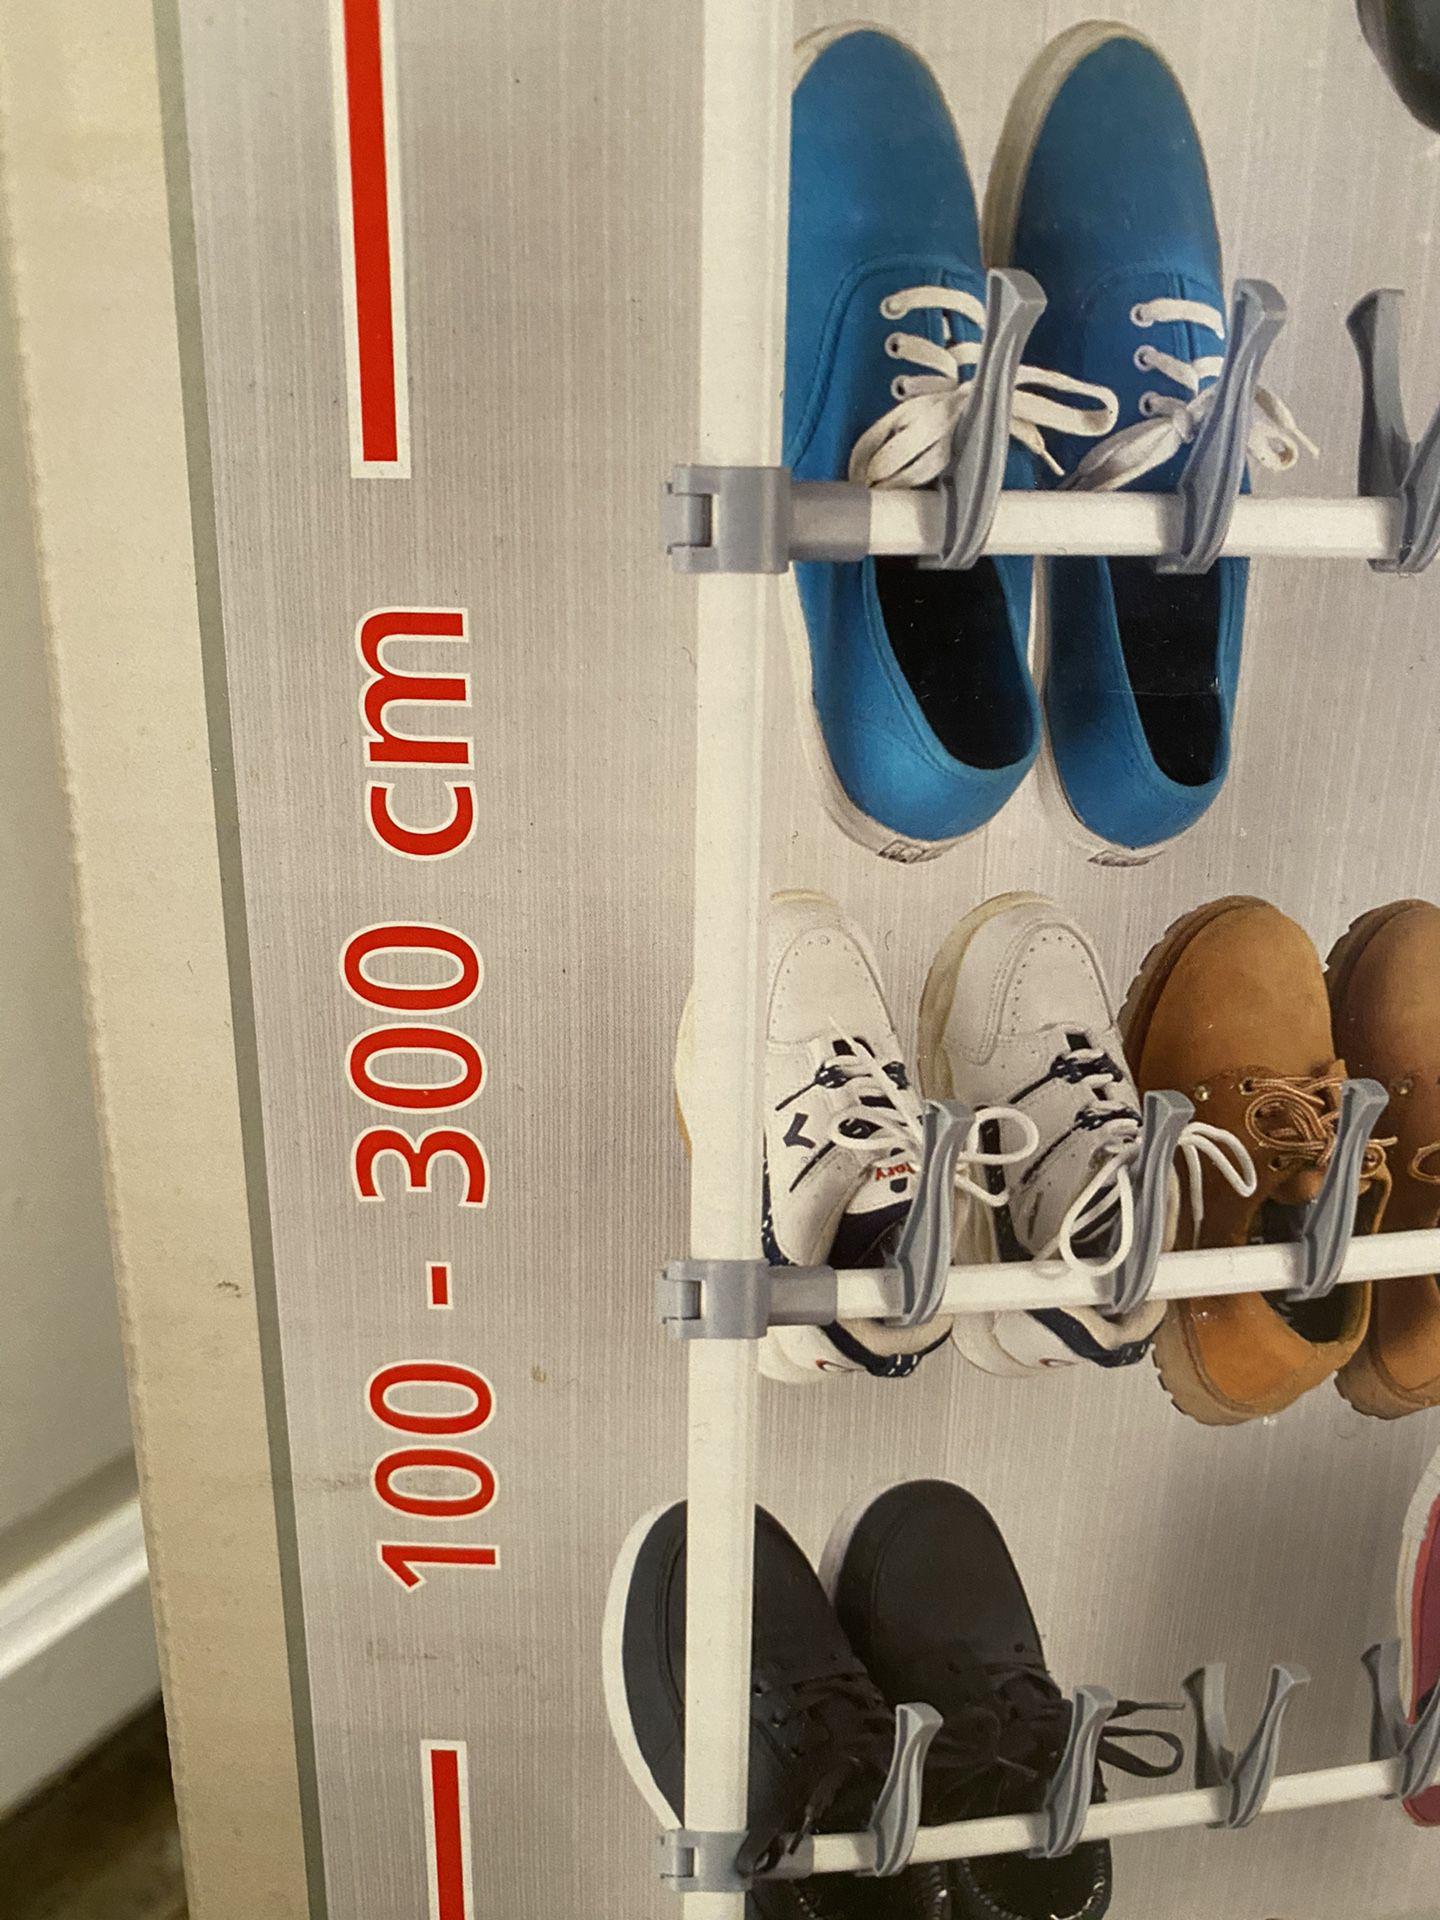 1Shoe Racks Sturdy vertical